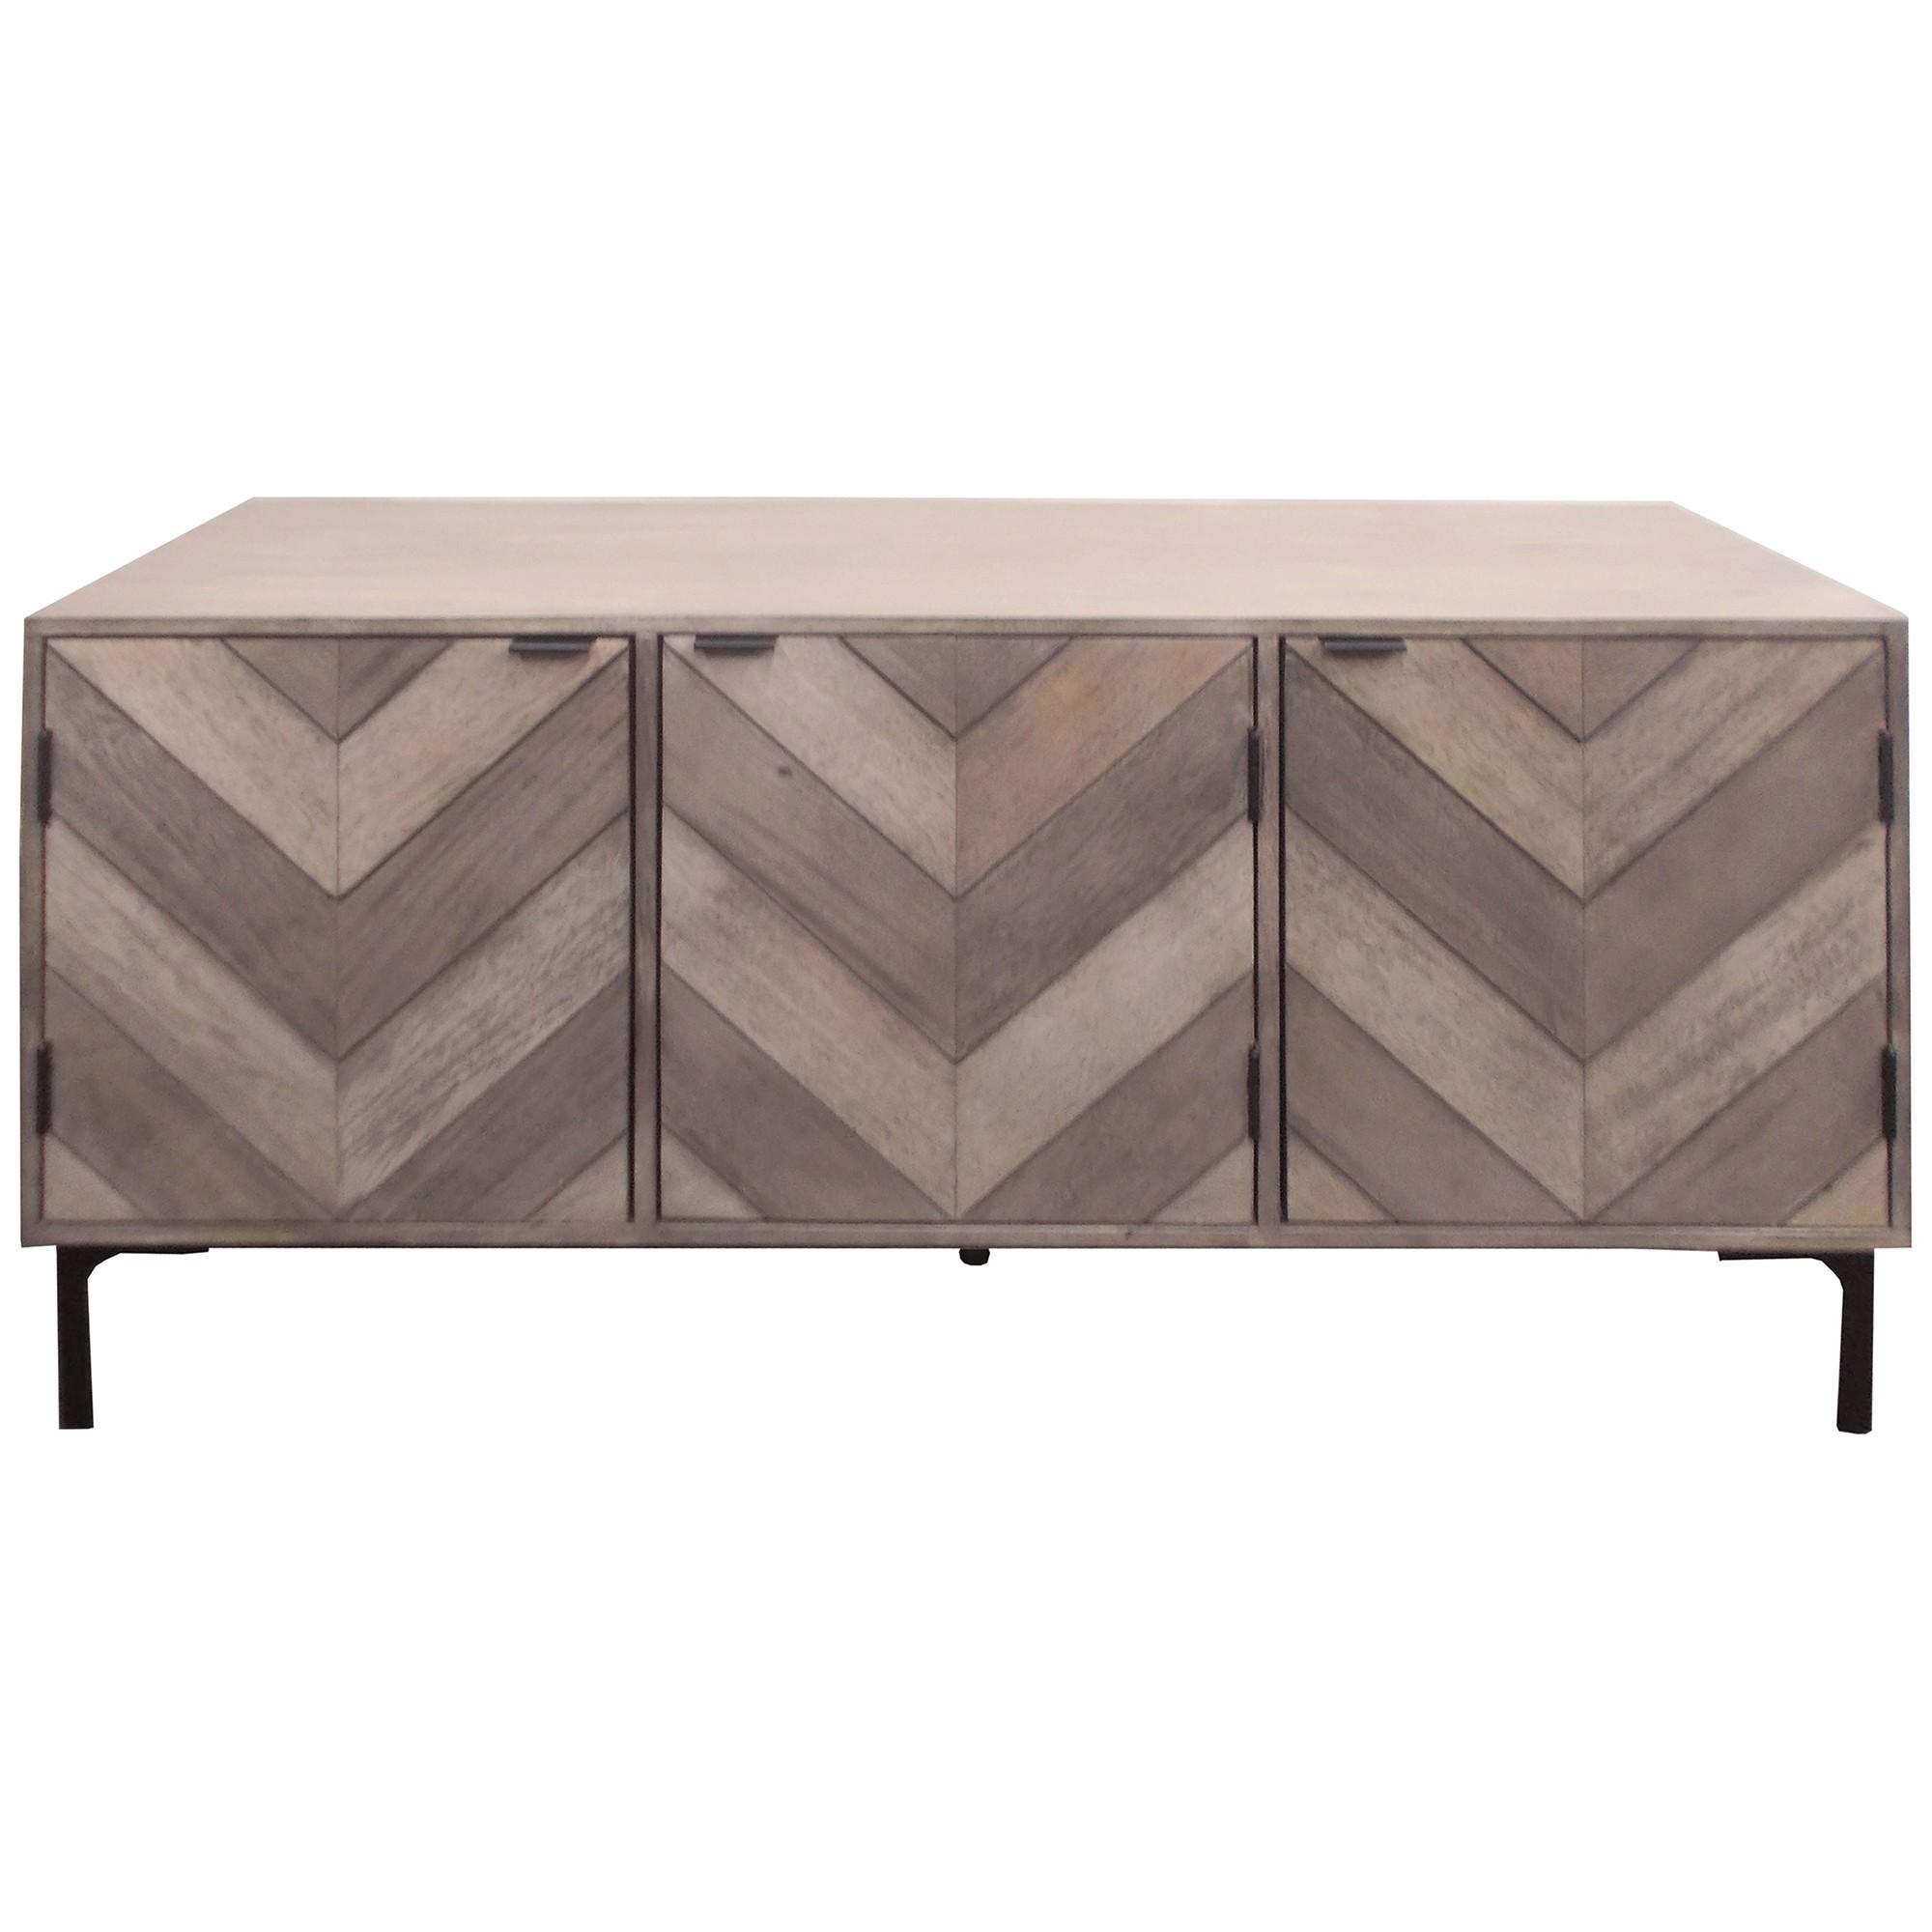 Bolazec Mango Wood 3 Door Buffet Table, 145cm